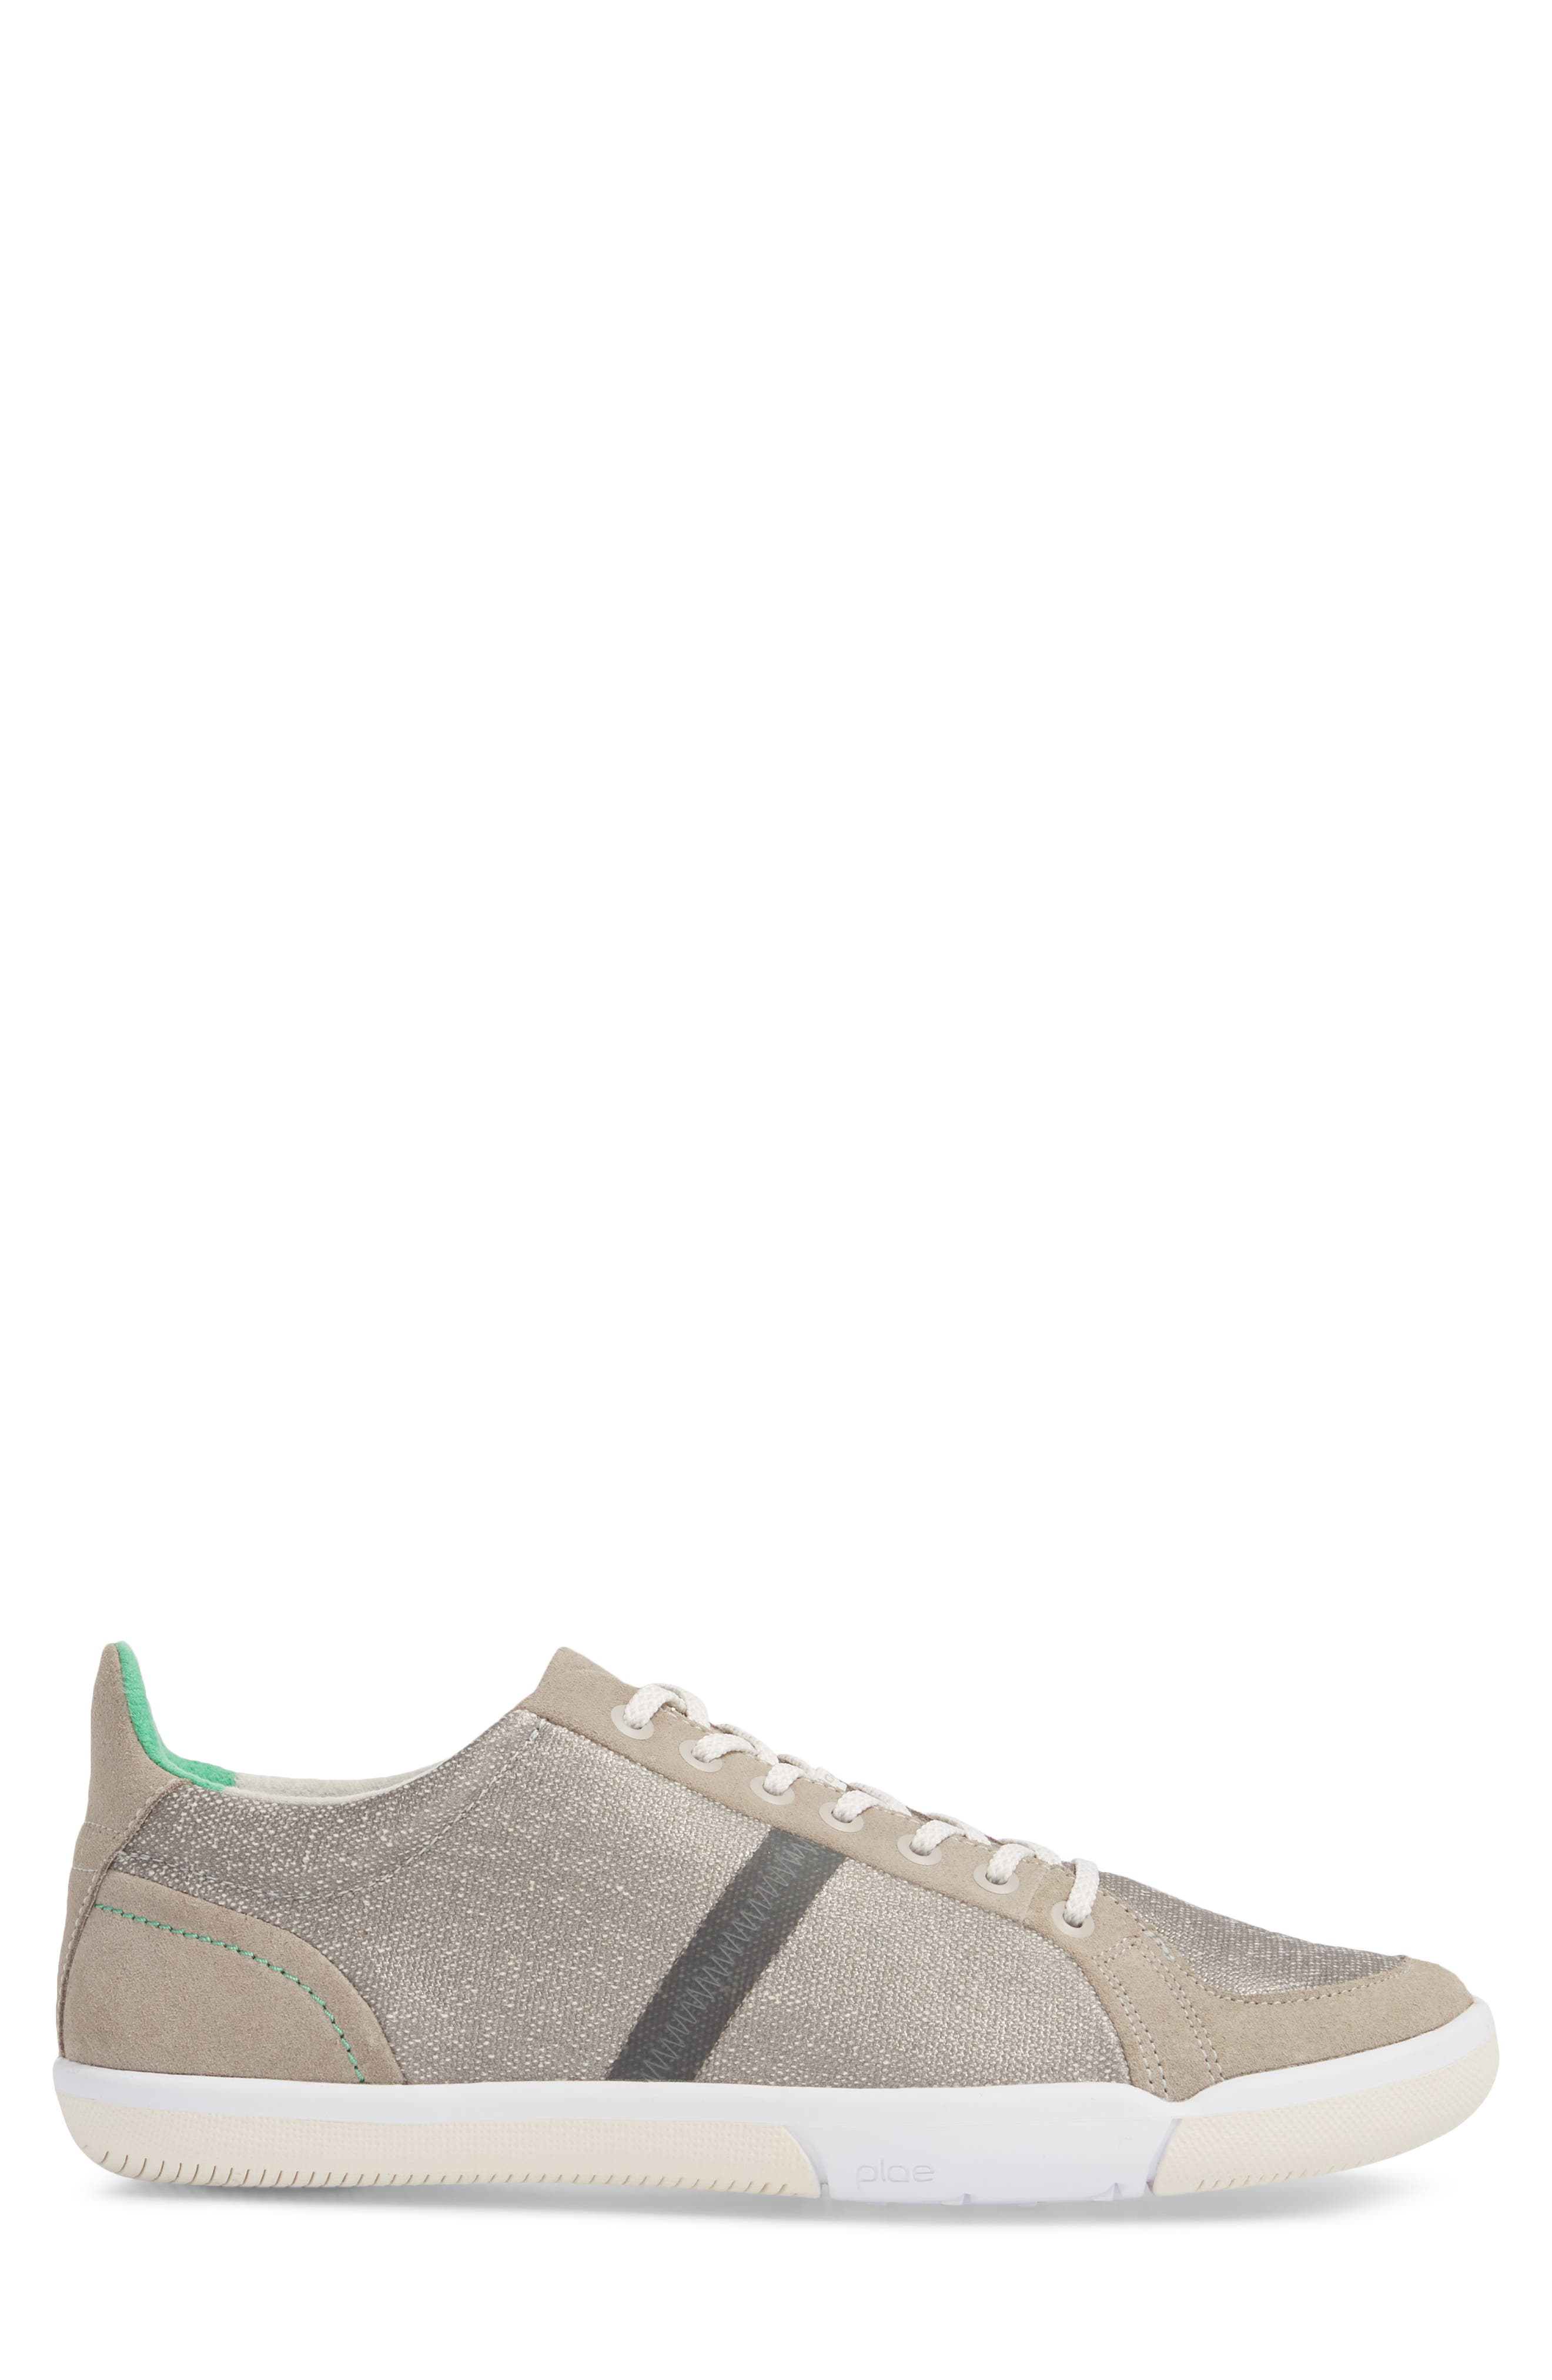 Prospect Low Top Sneaker,                             Alternate thumbnail 3, color,                             STONE